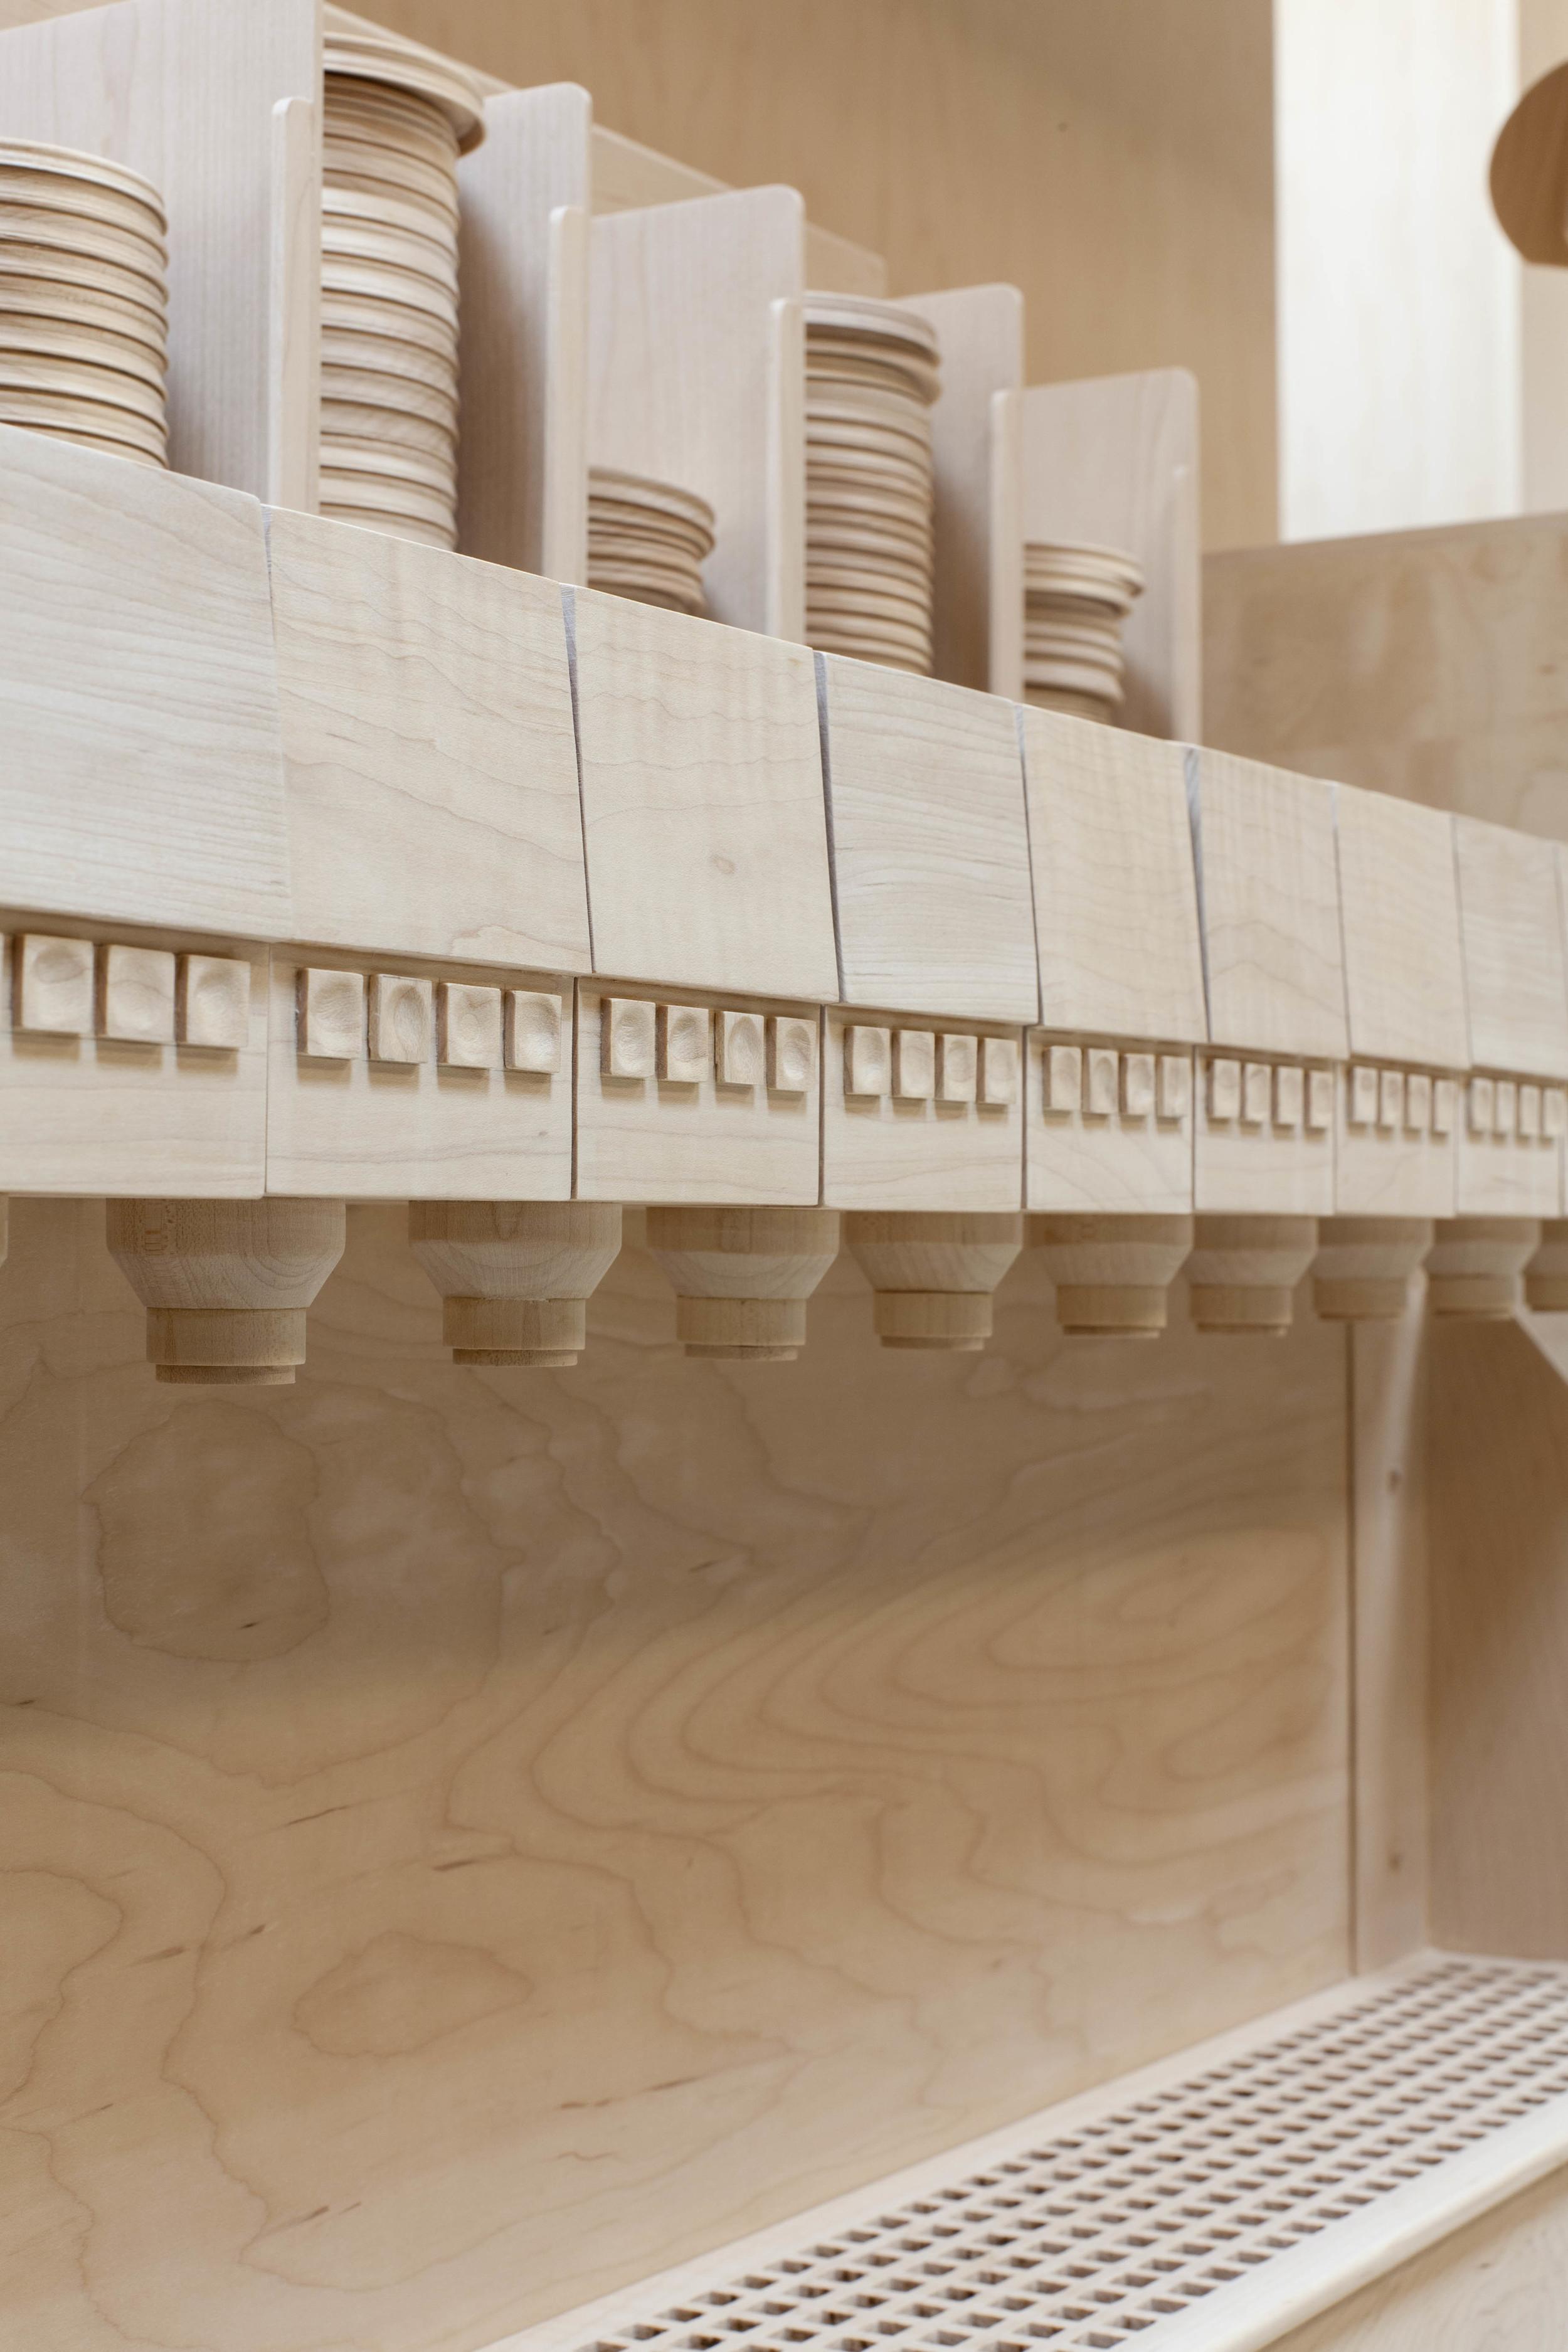 Apparatus-Interiors-28-300.jpg